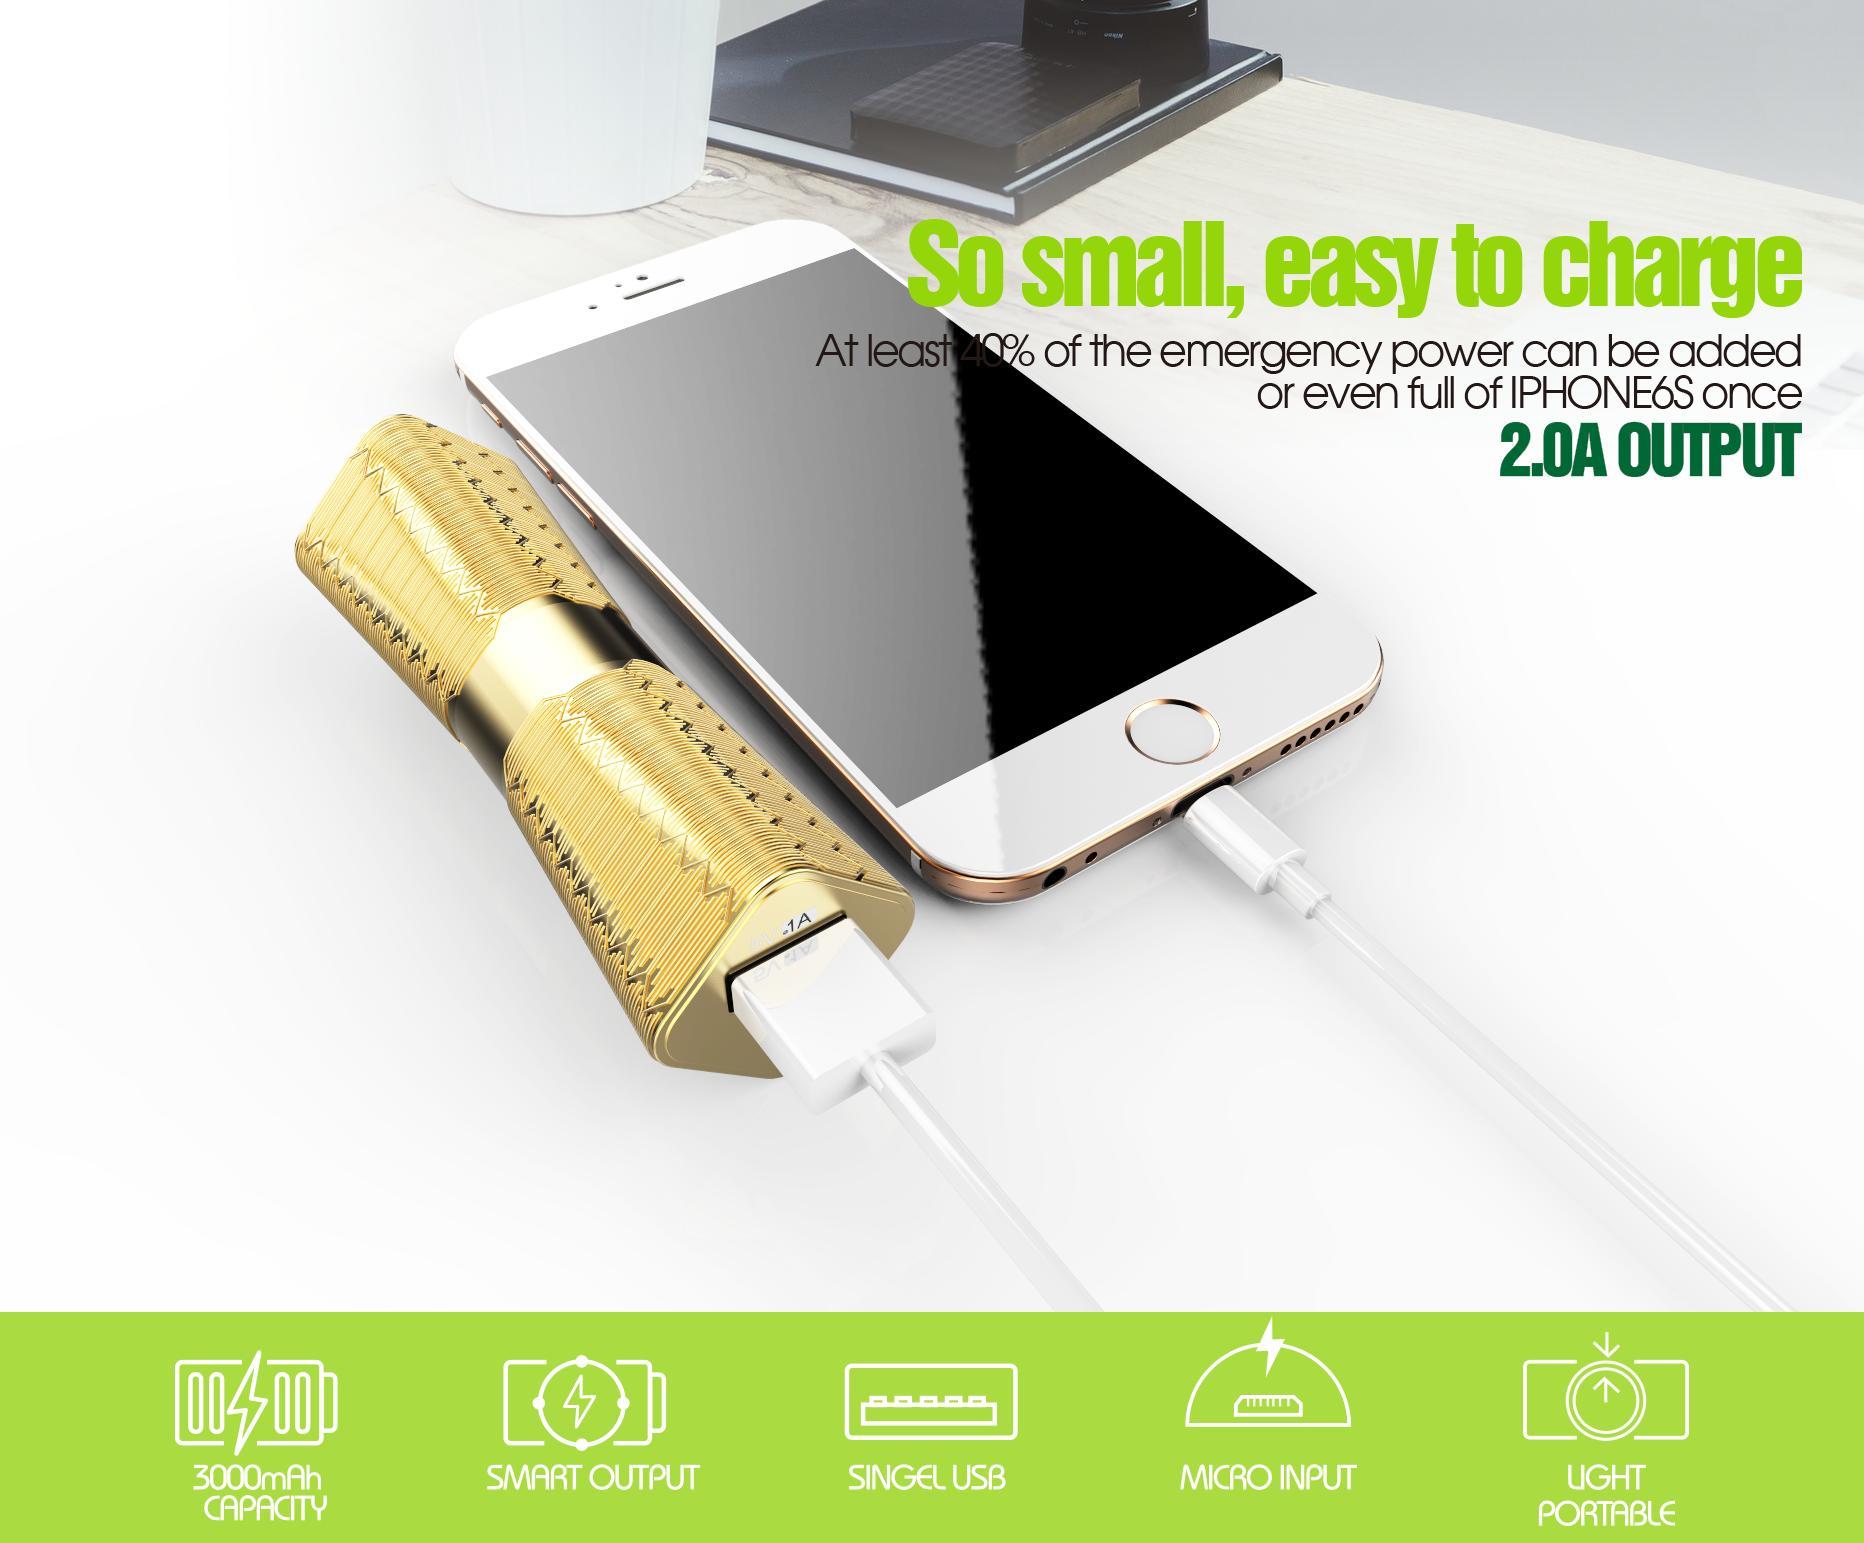 Bavin 3000mah Portable Power bank PC167